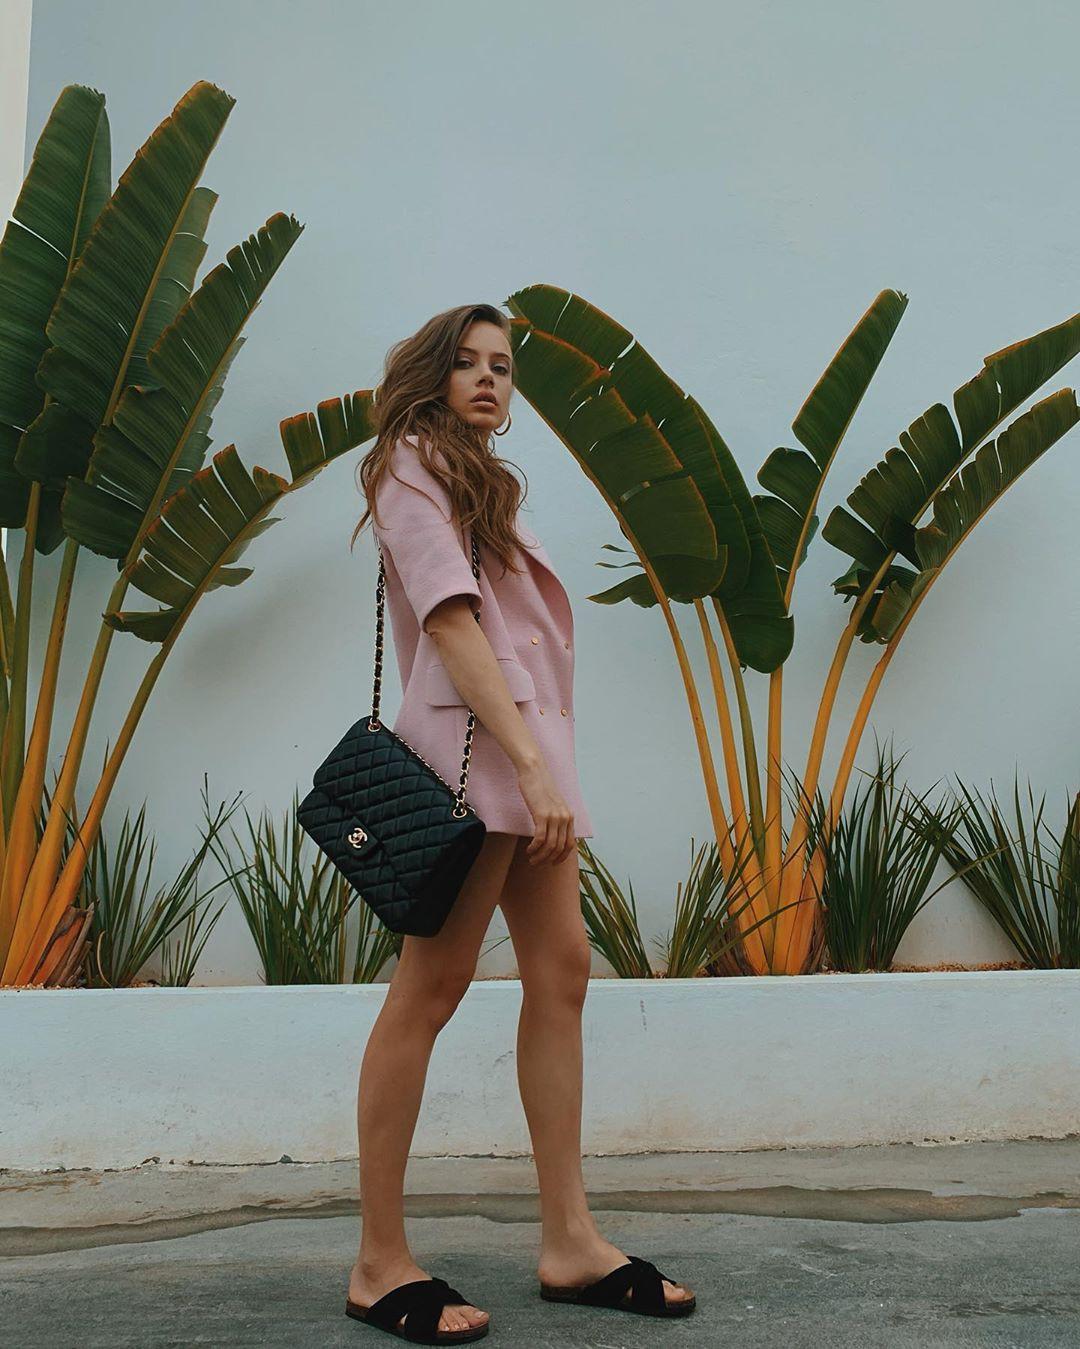 Xenia Tchoumitcheva shorts matching outfit, cute girls photos, legs pic